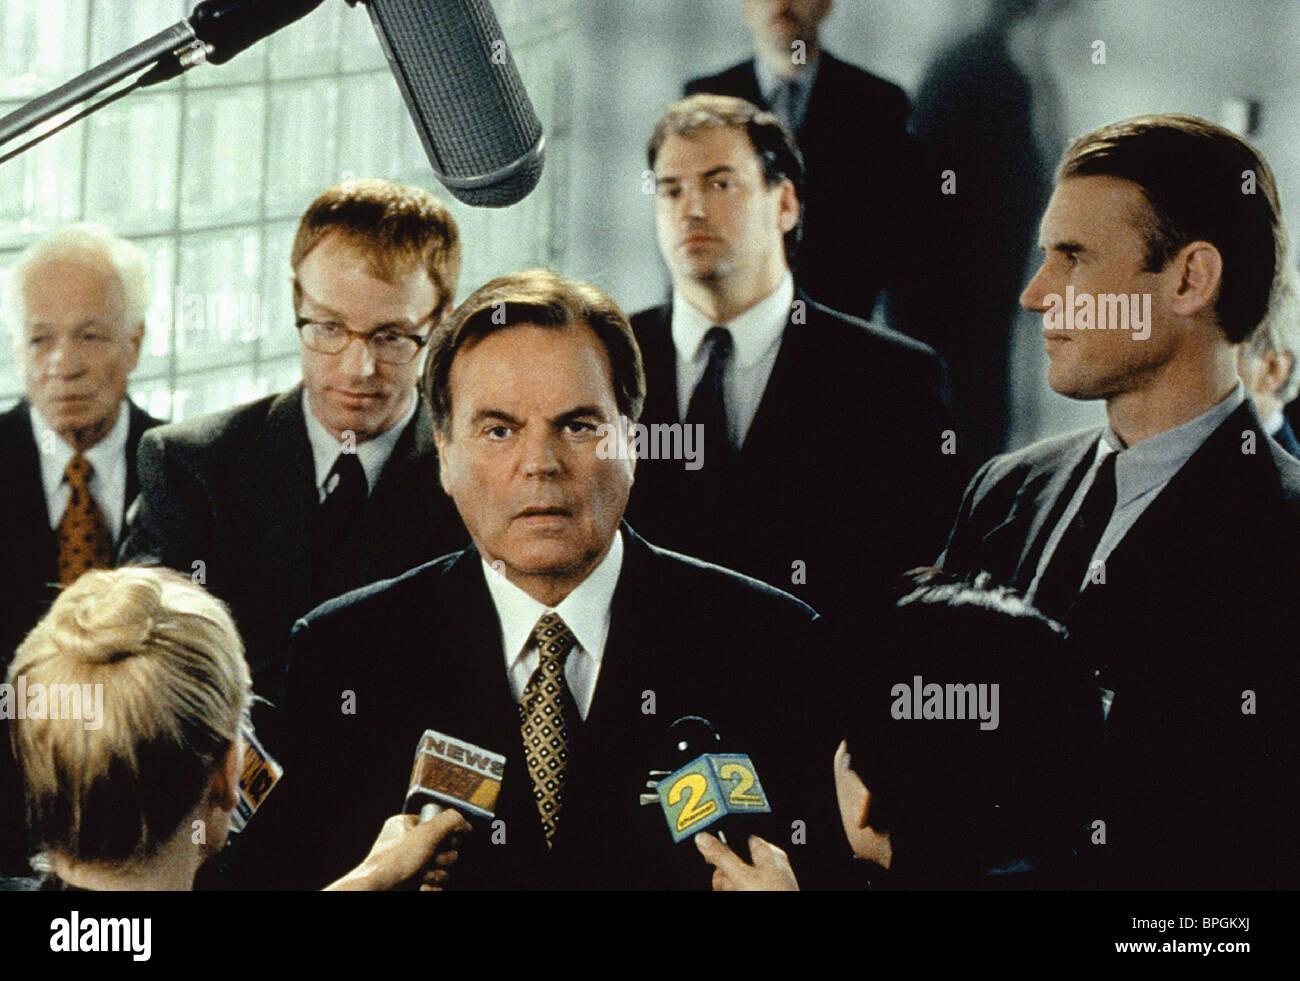 ROBERT WAGNER SCHWERWIEGENDER FEHLER (1999) Stockbild